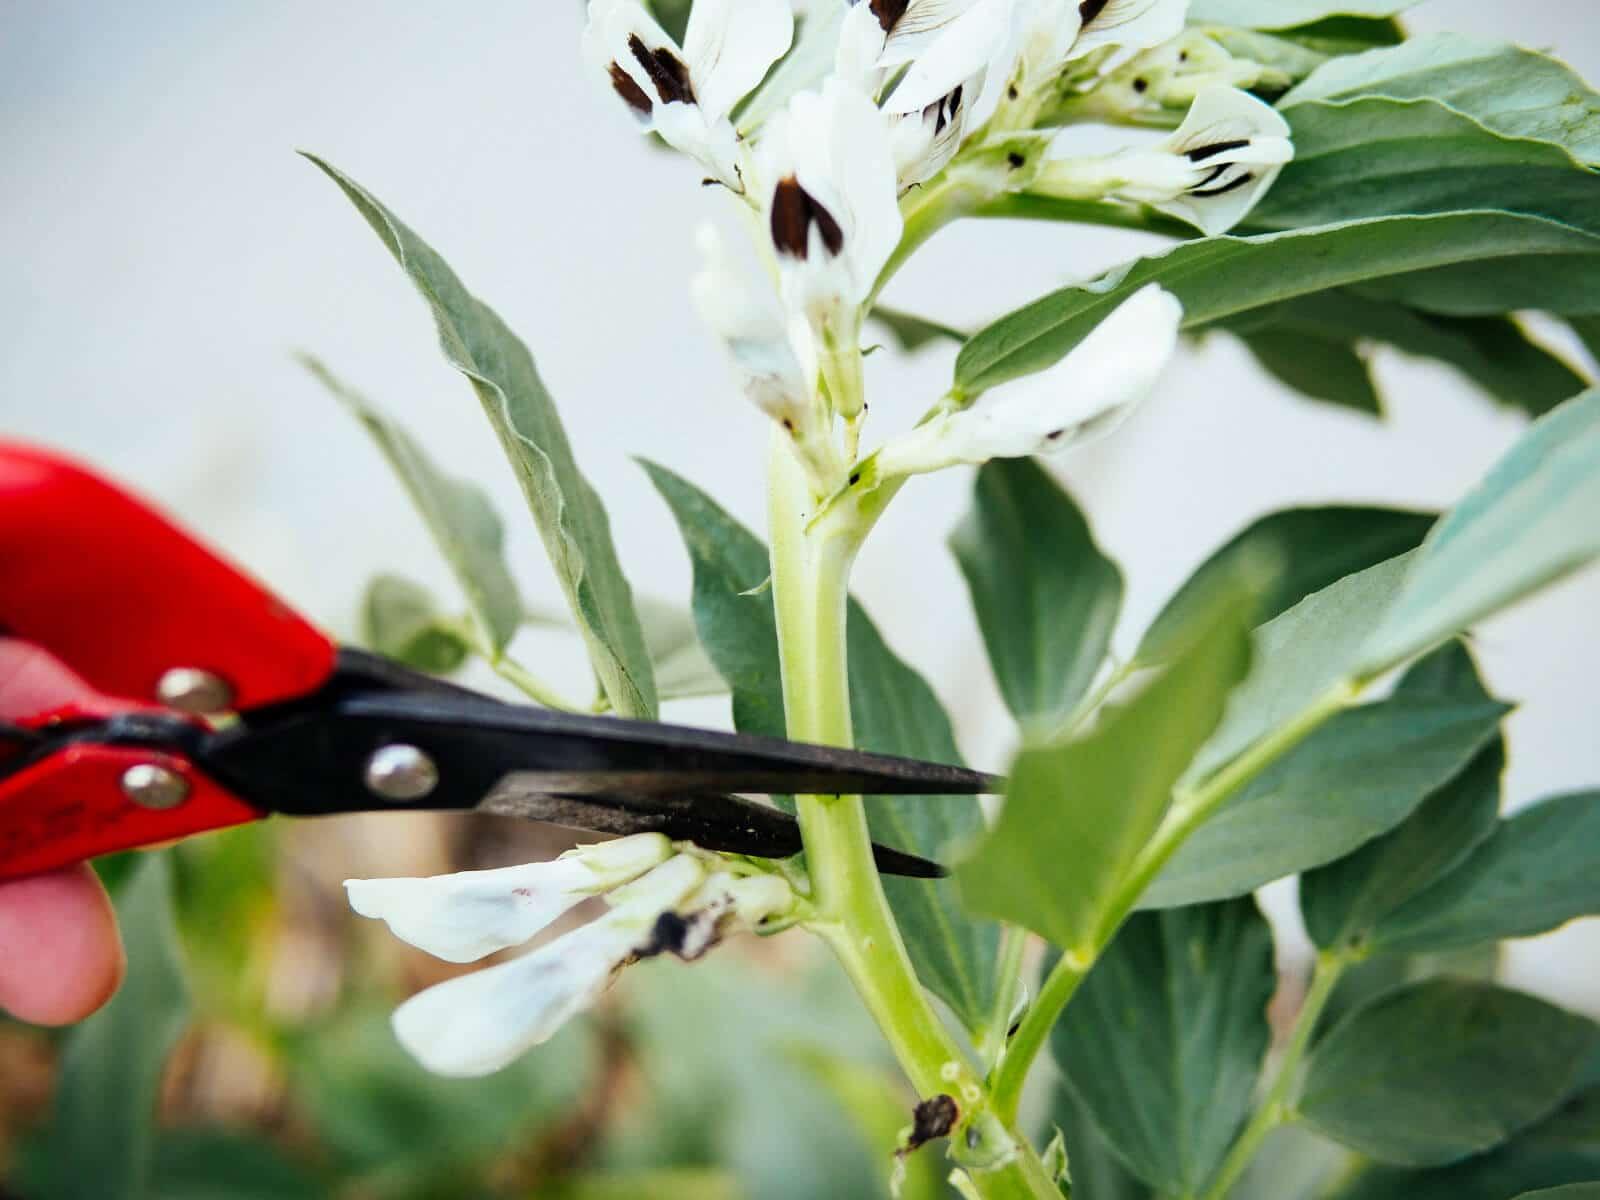 Prune a fava bean plant just above a leaf node